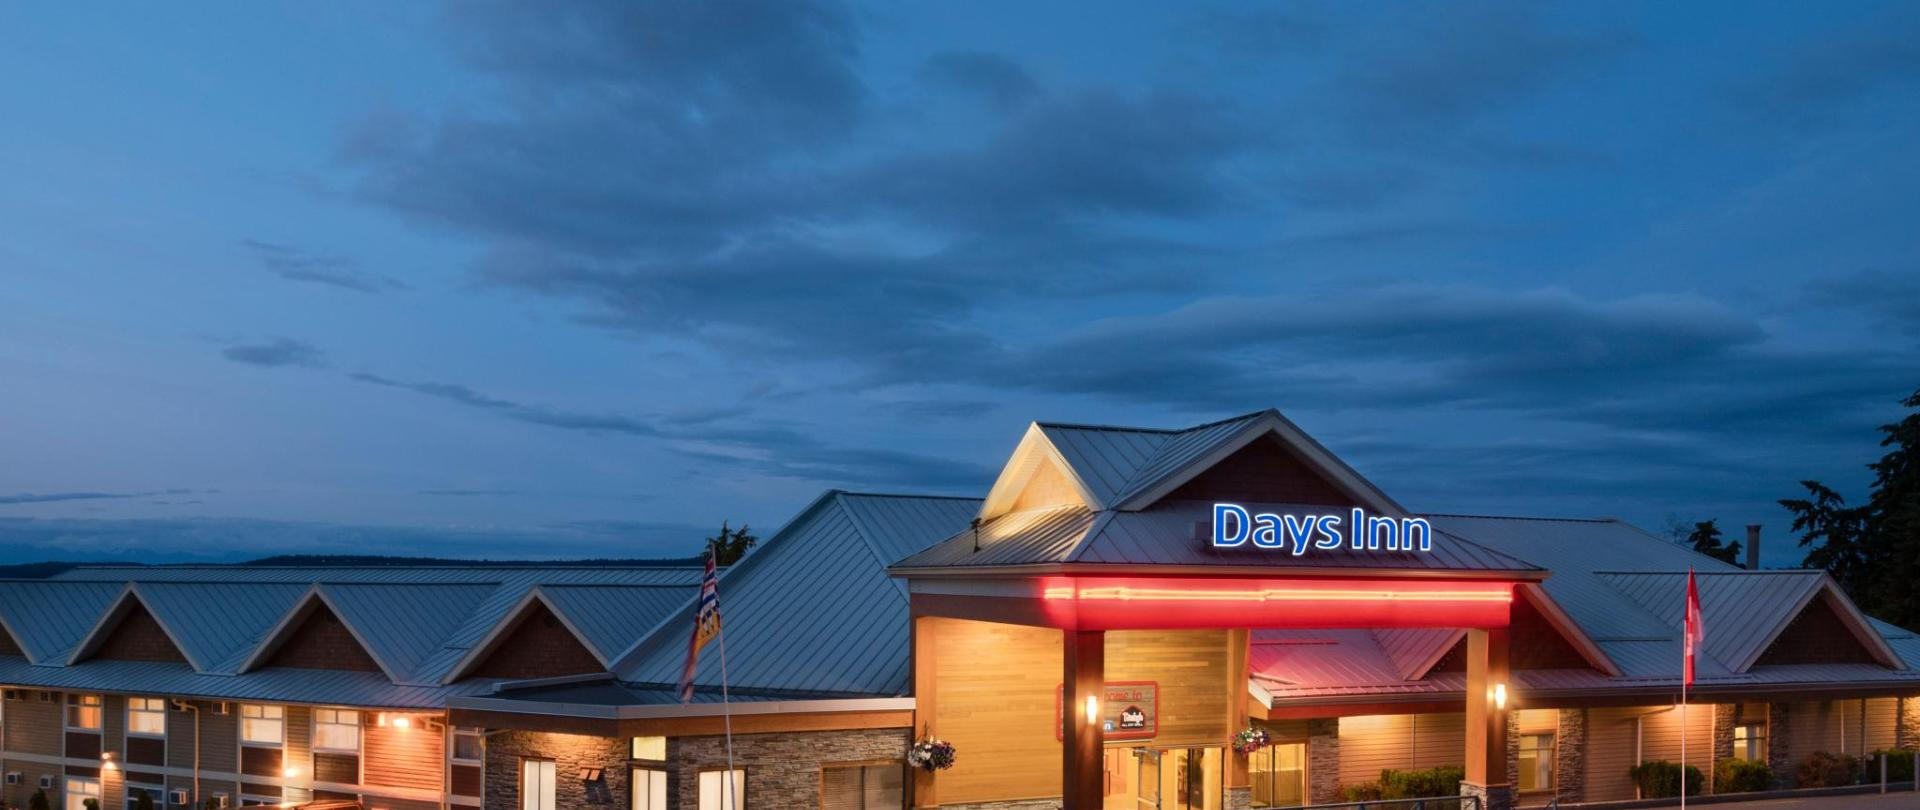 Days Inn Nanaimo - Exterior - 1446713.jpg